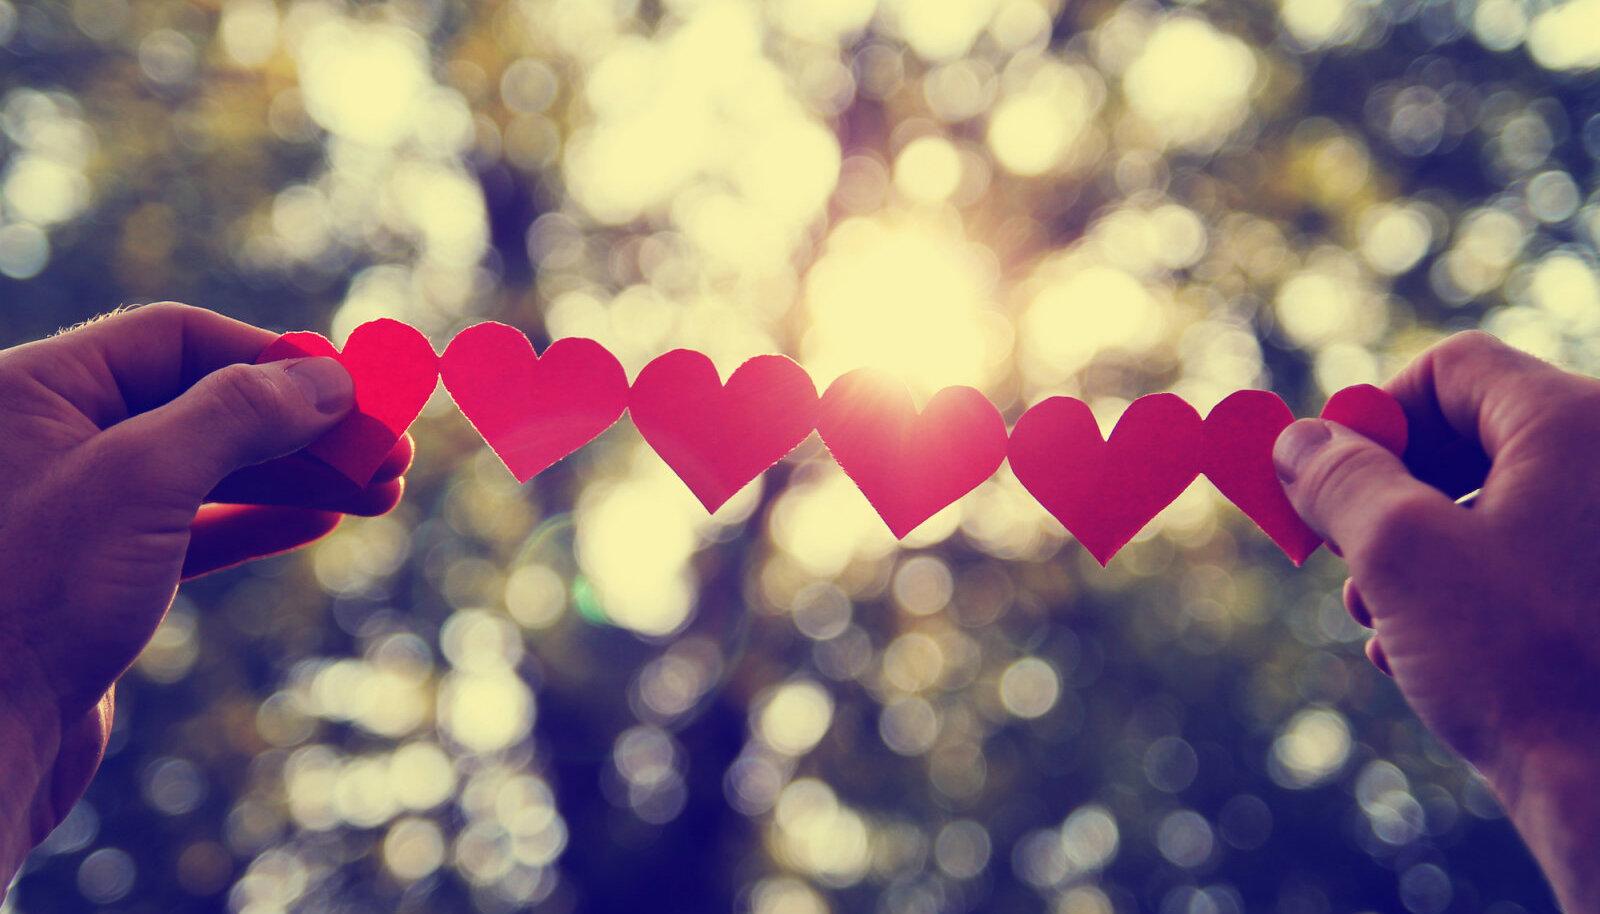 Järgi oma südame rada